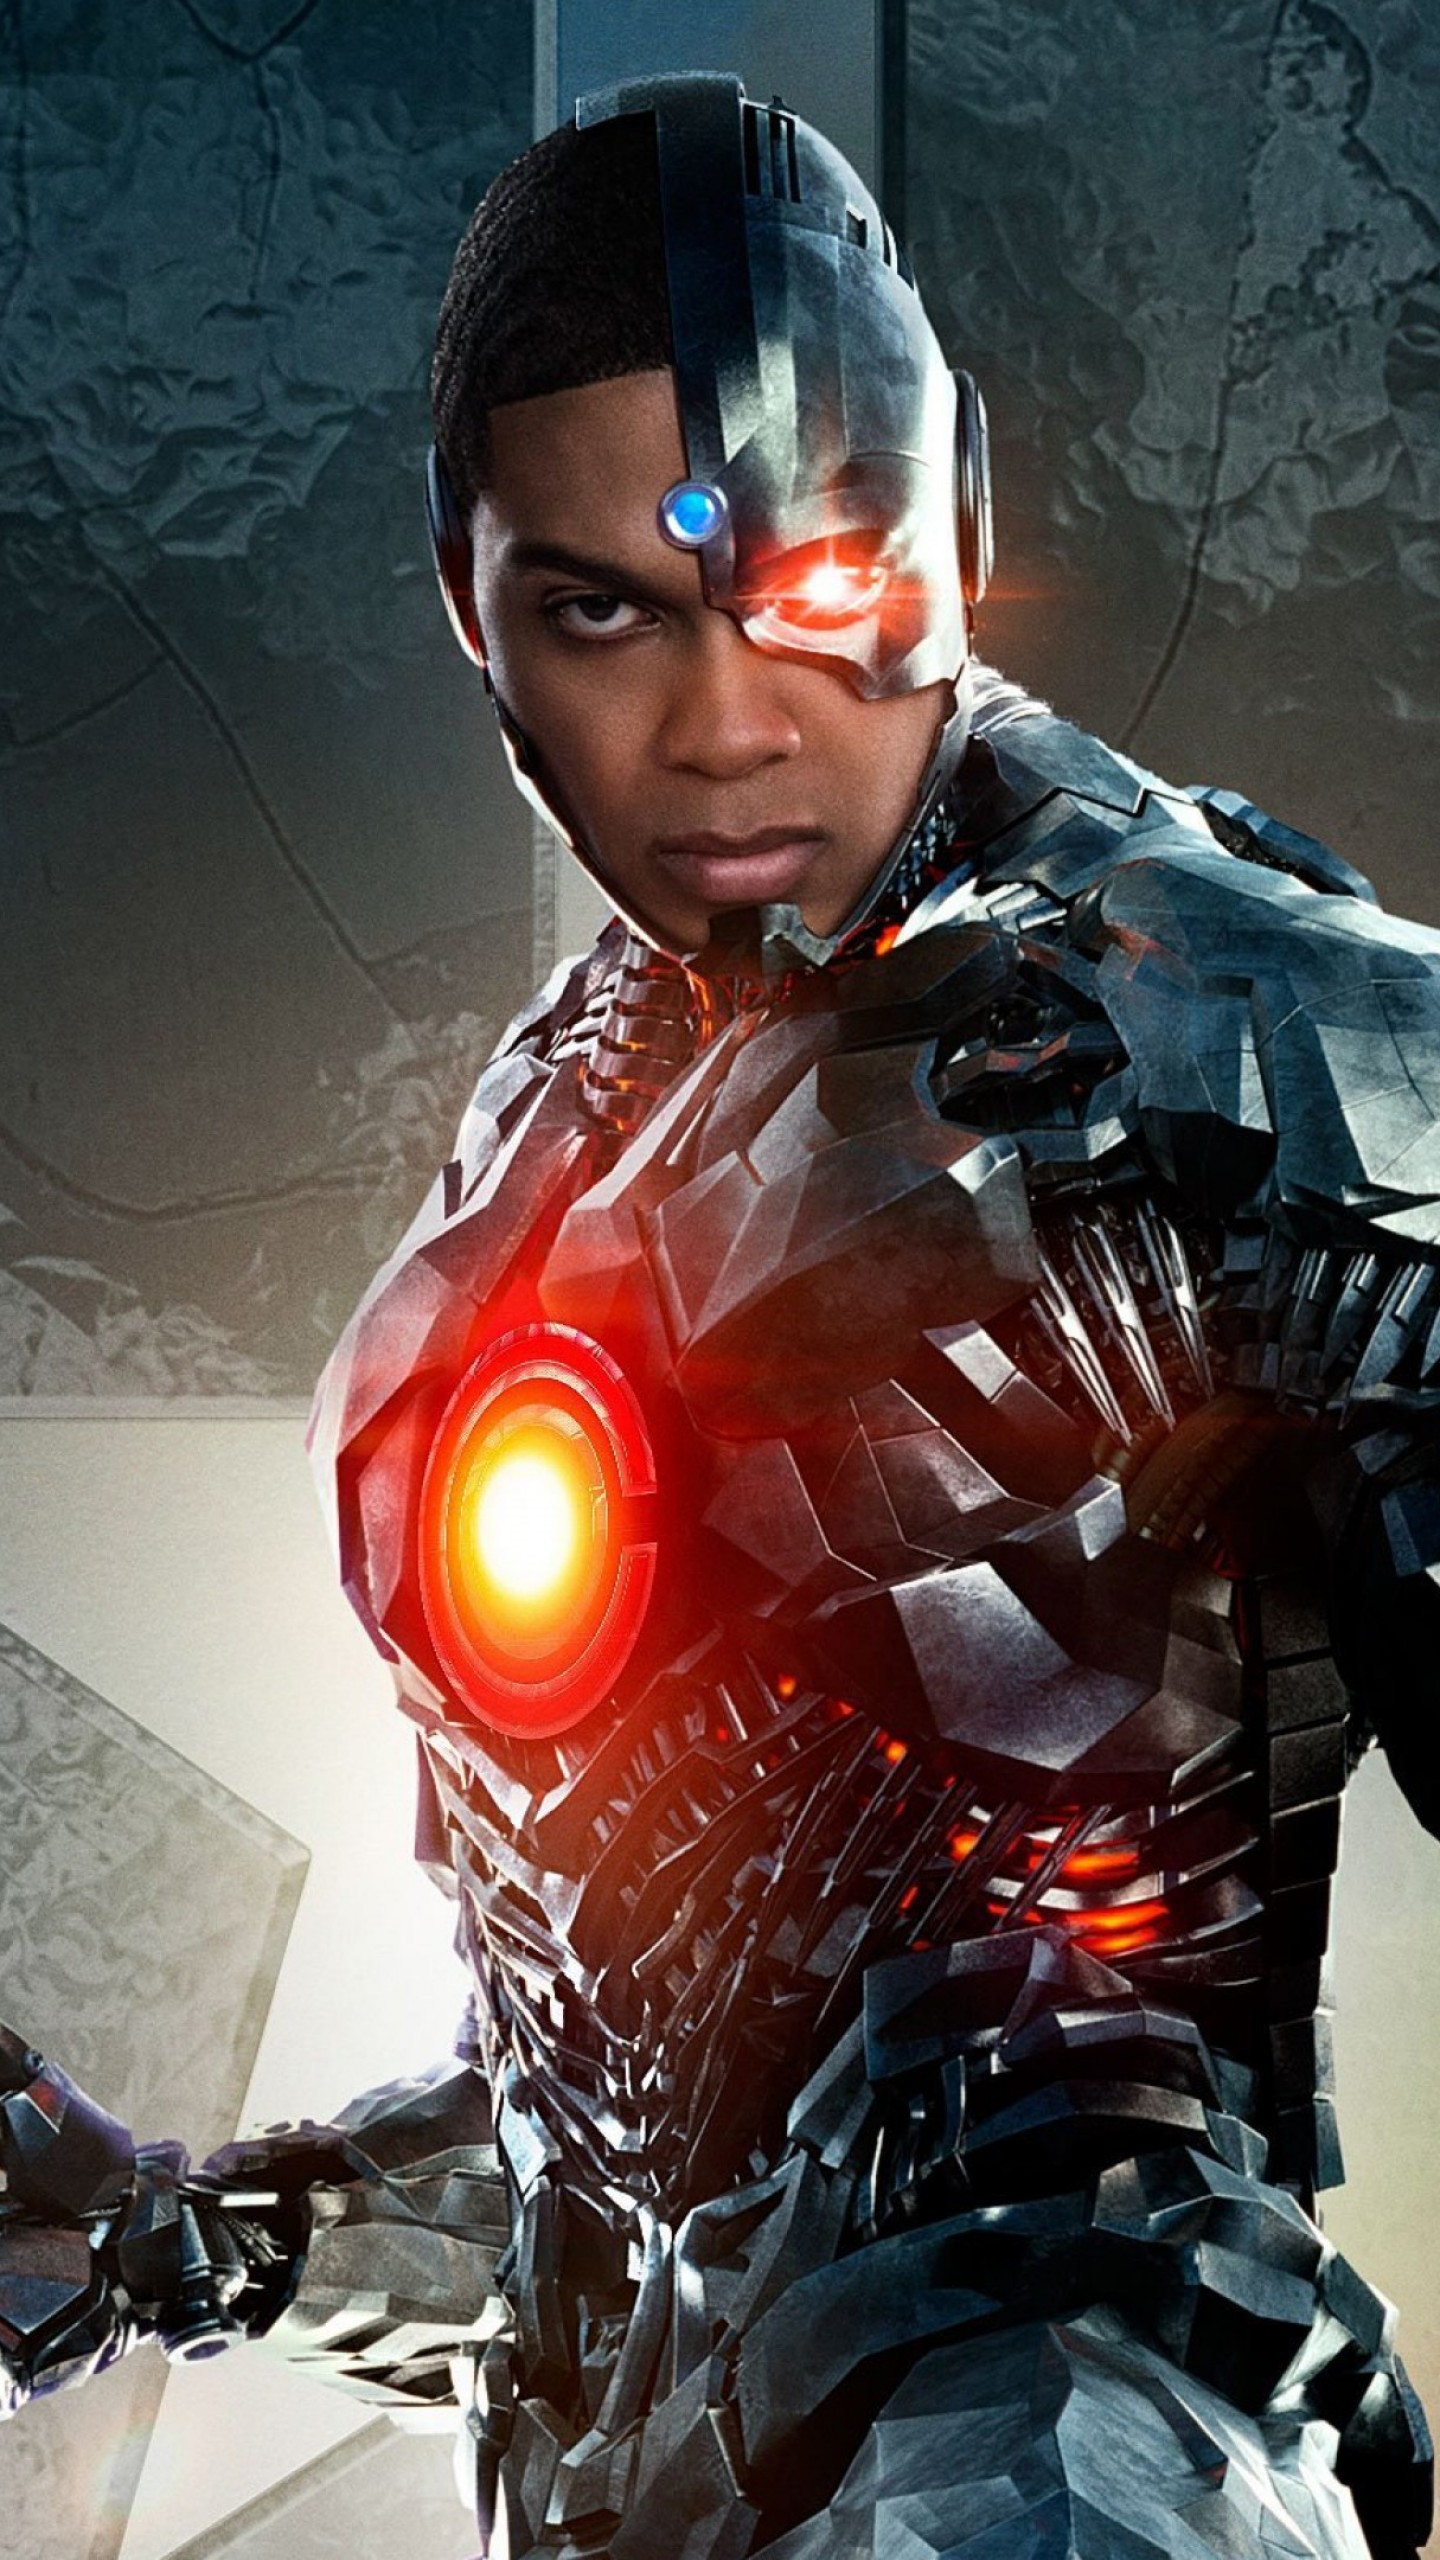 Wallpaper Justice League Cyborg 4k Movies 15017